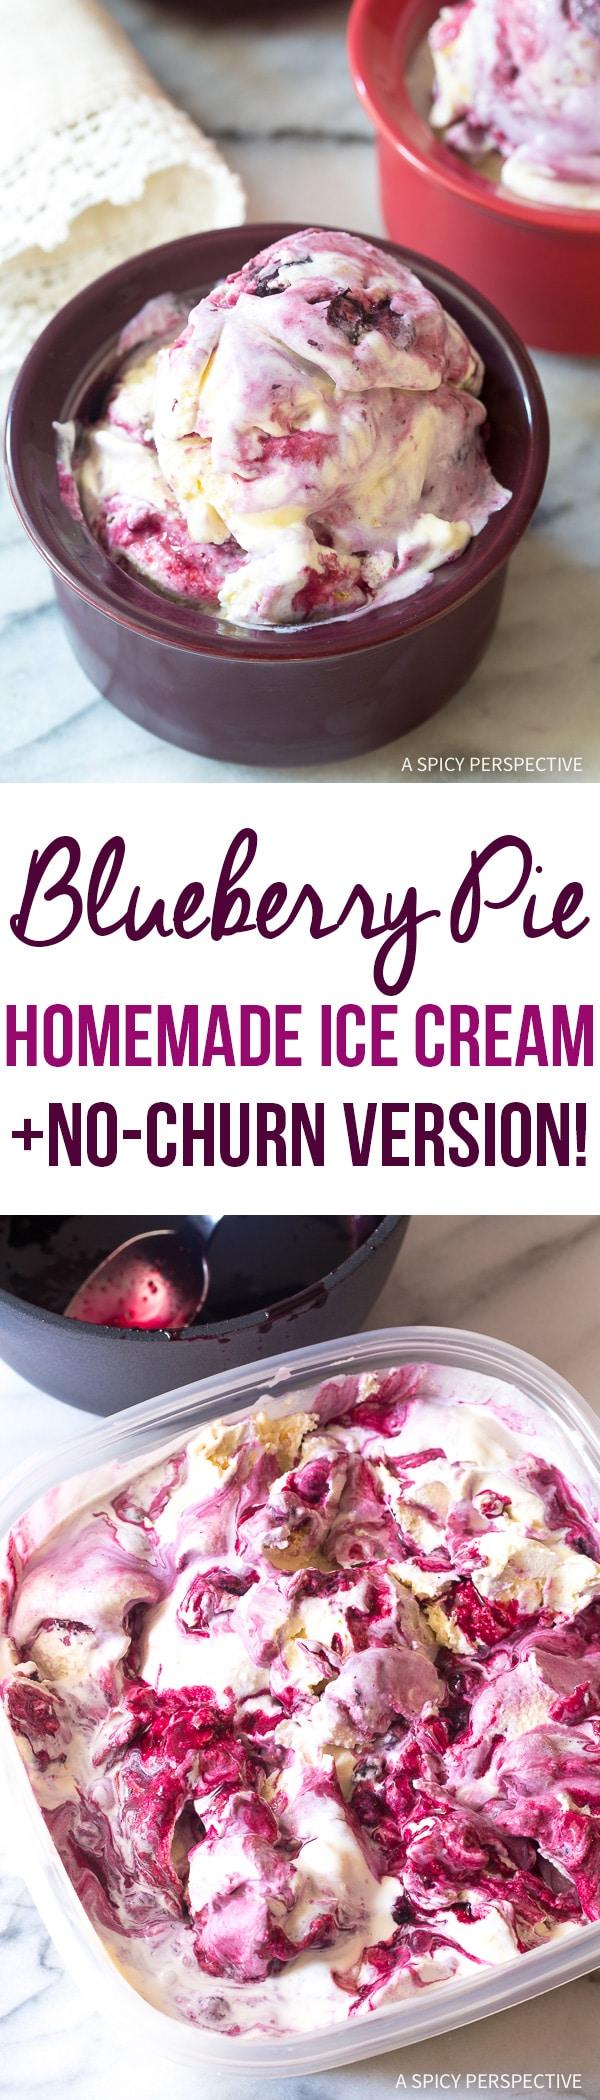 Amazing Blueberry Pie Homemade Ice Cream Recipe + Quick No-Churn Version!